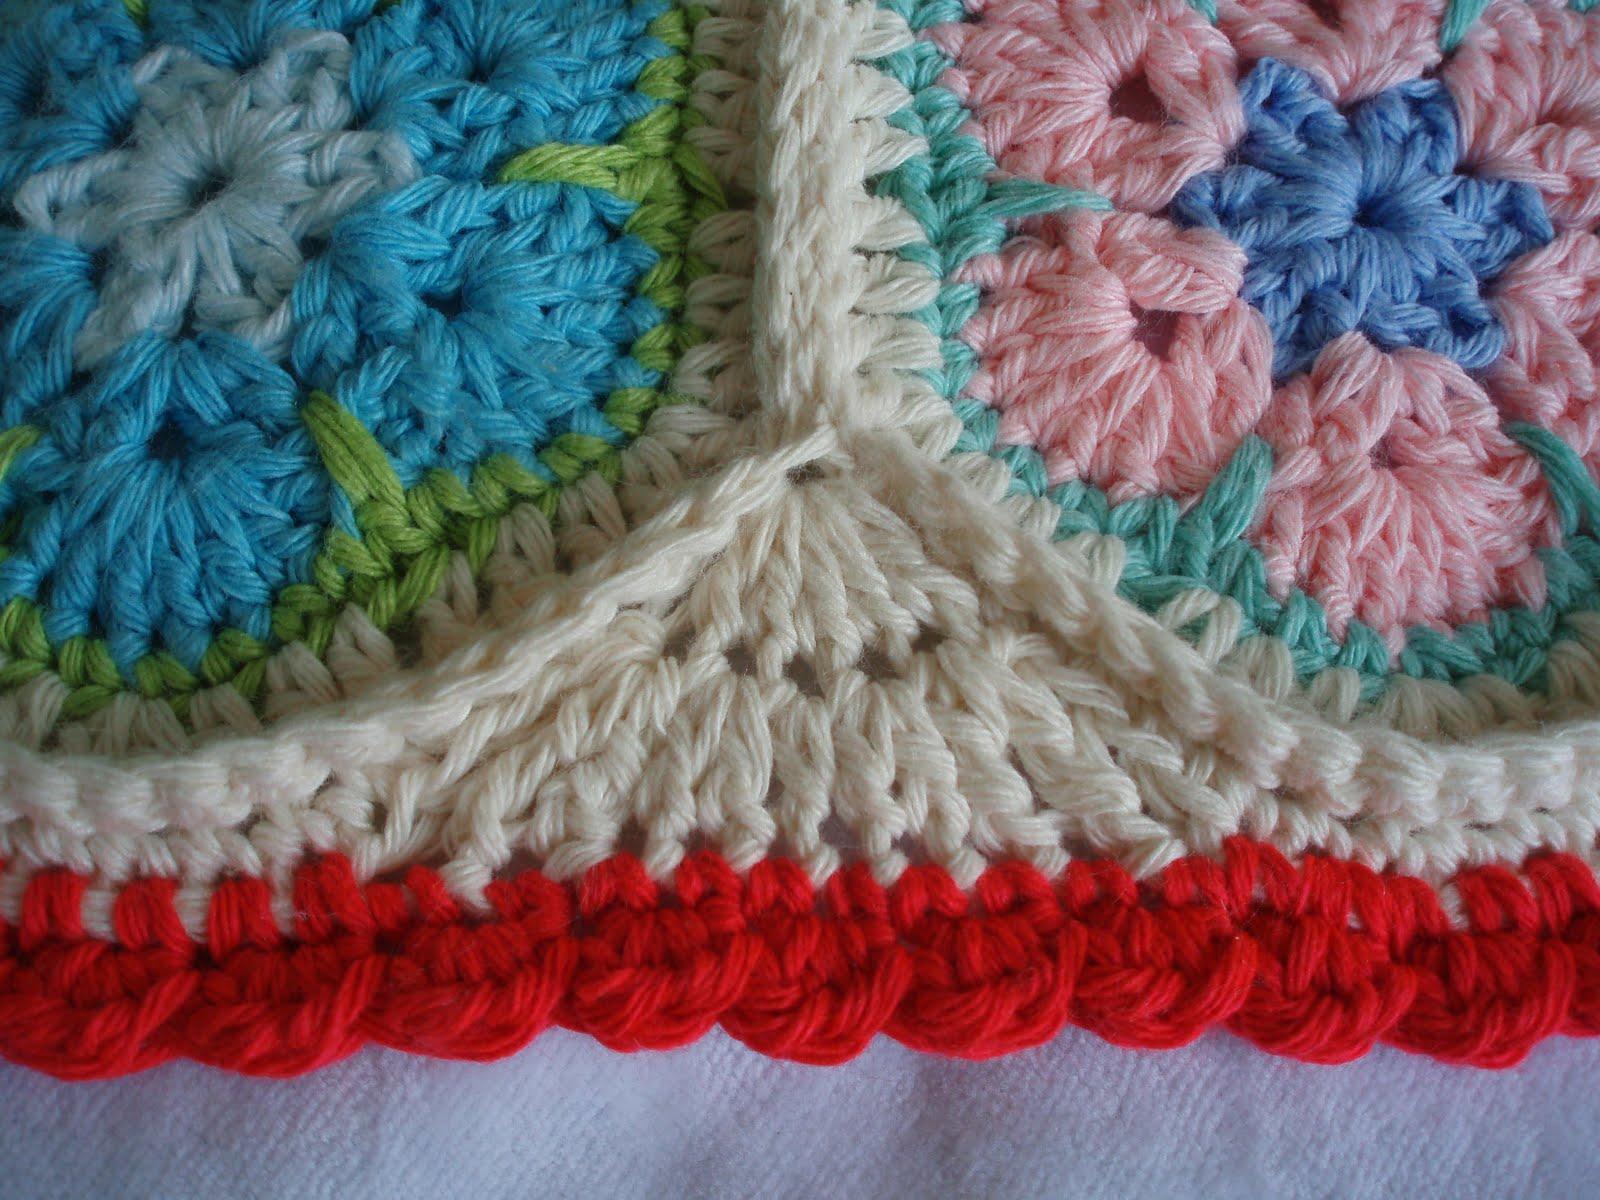 African Flower Crochet Pattern Half : Karin aan de haak: Afrikaanse Bloemen Kussen